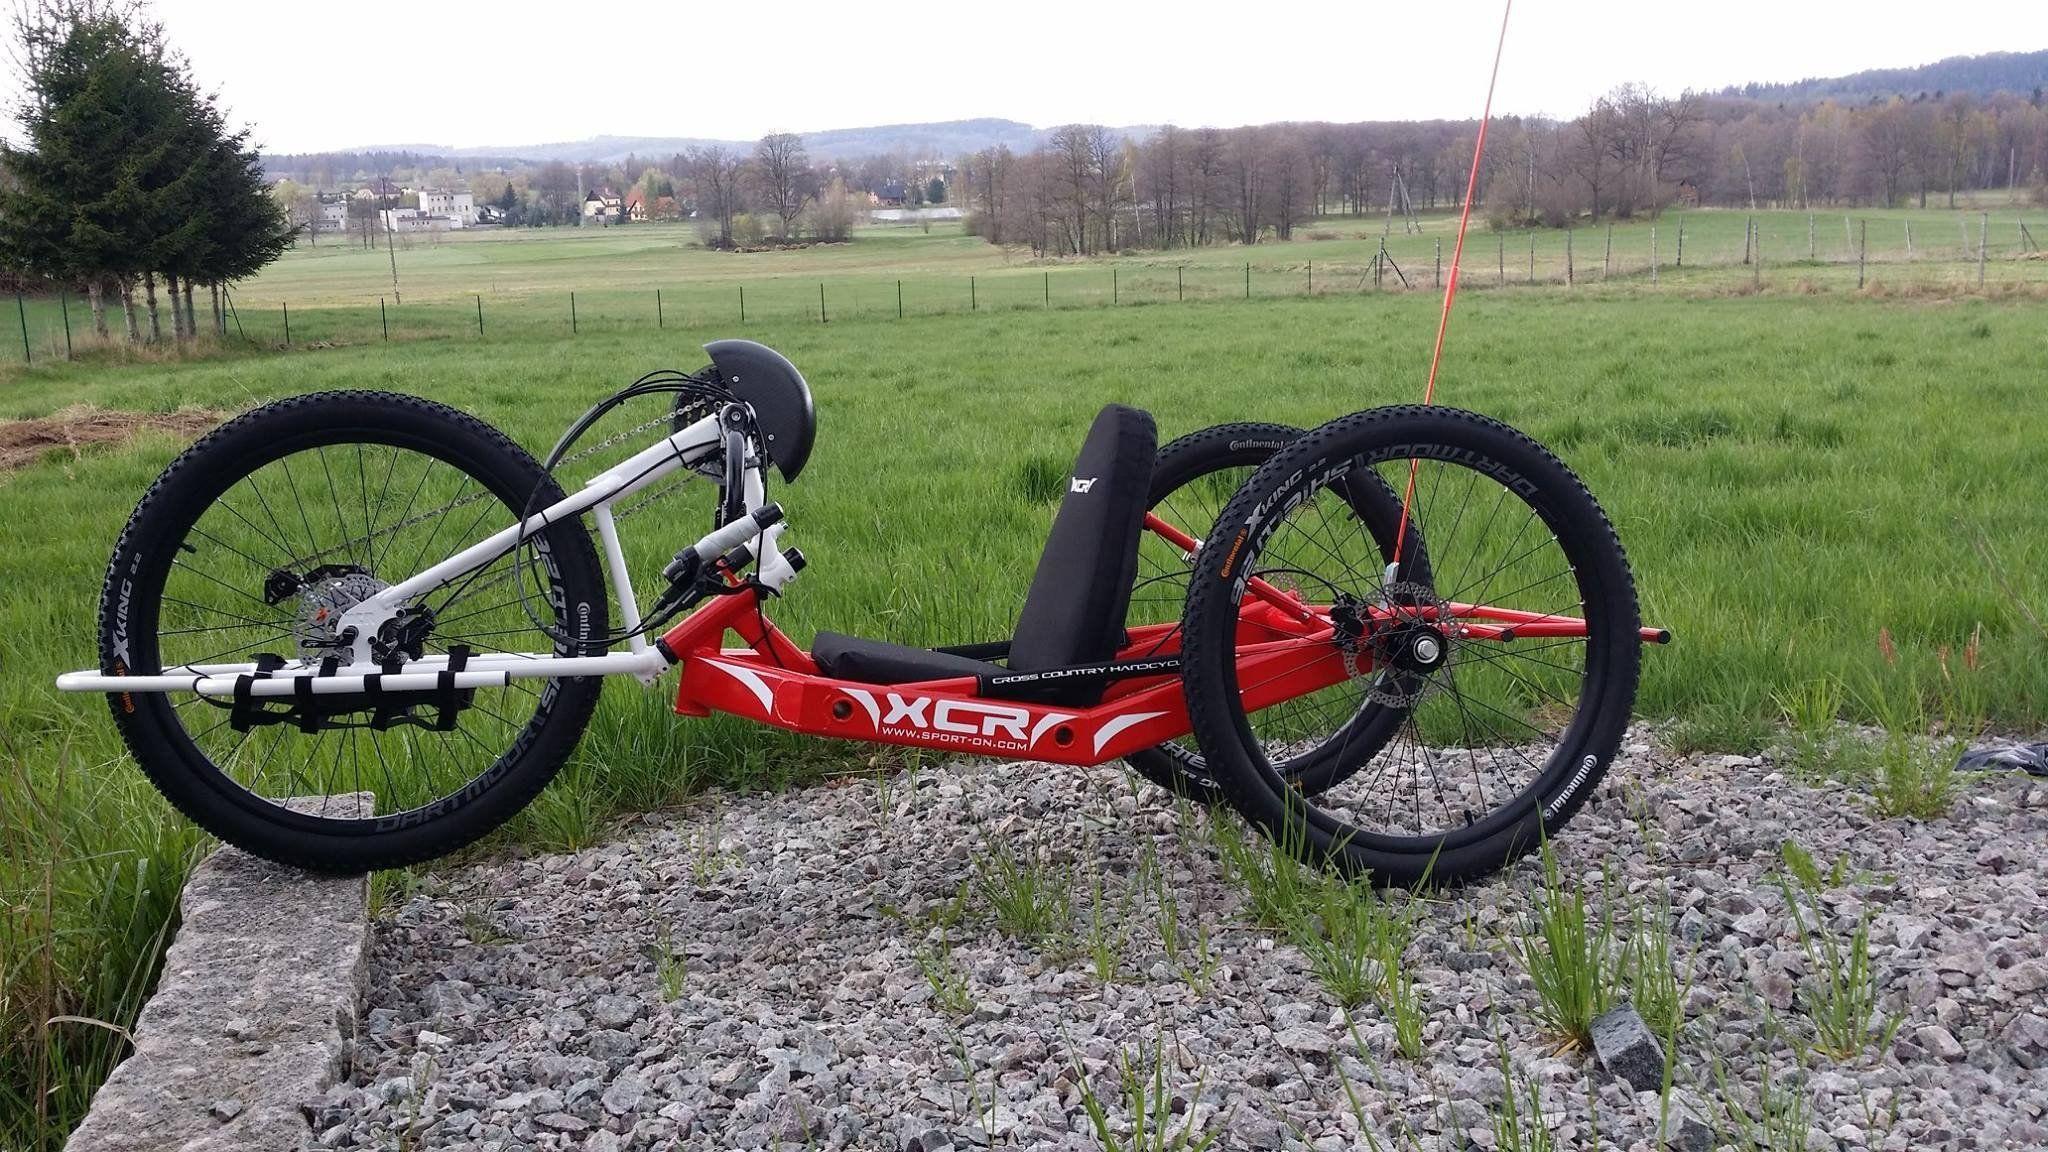 Handbike Xcr Rower Trojkolowy 6845925339 Oficjalne Archiwum Allegro Bicycle Moped Motorcycle